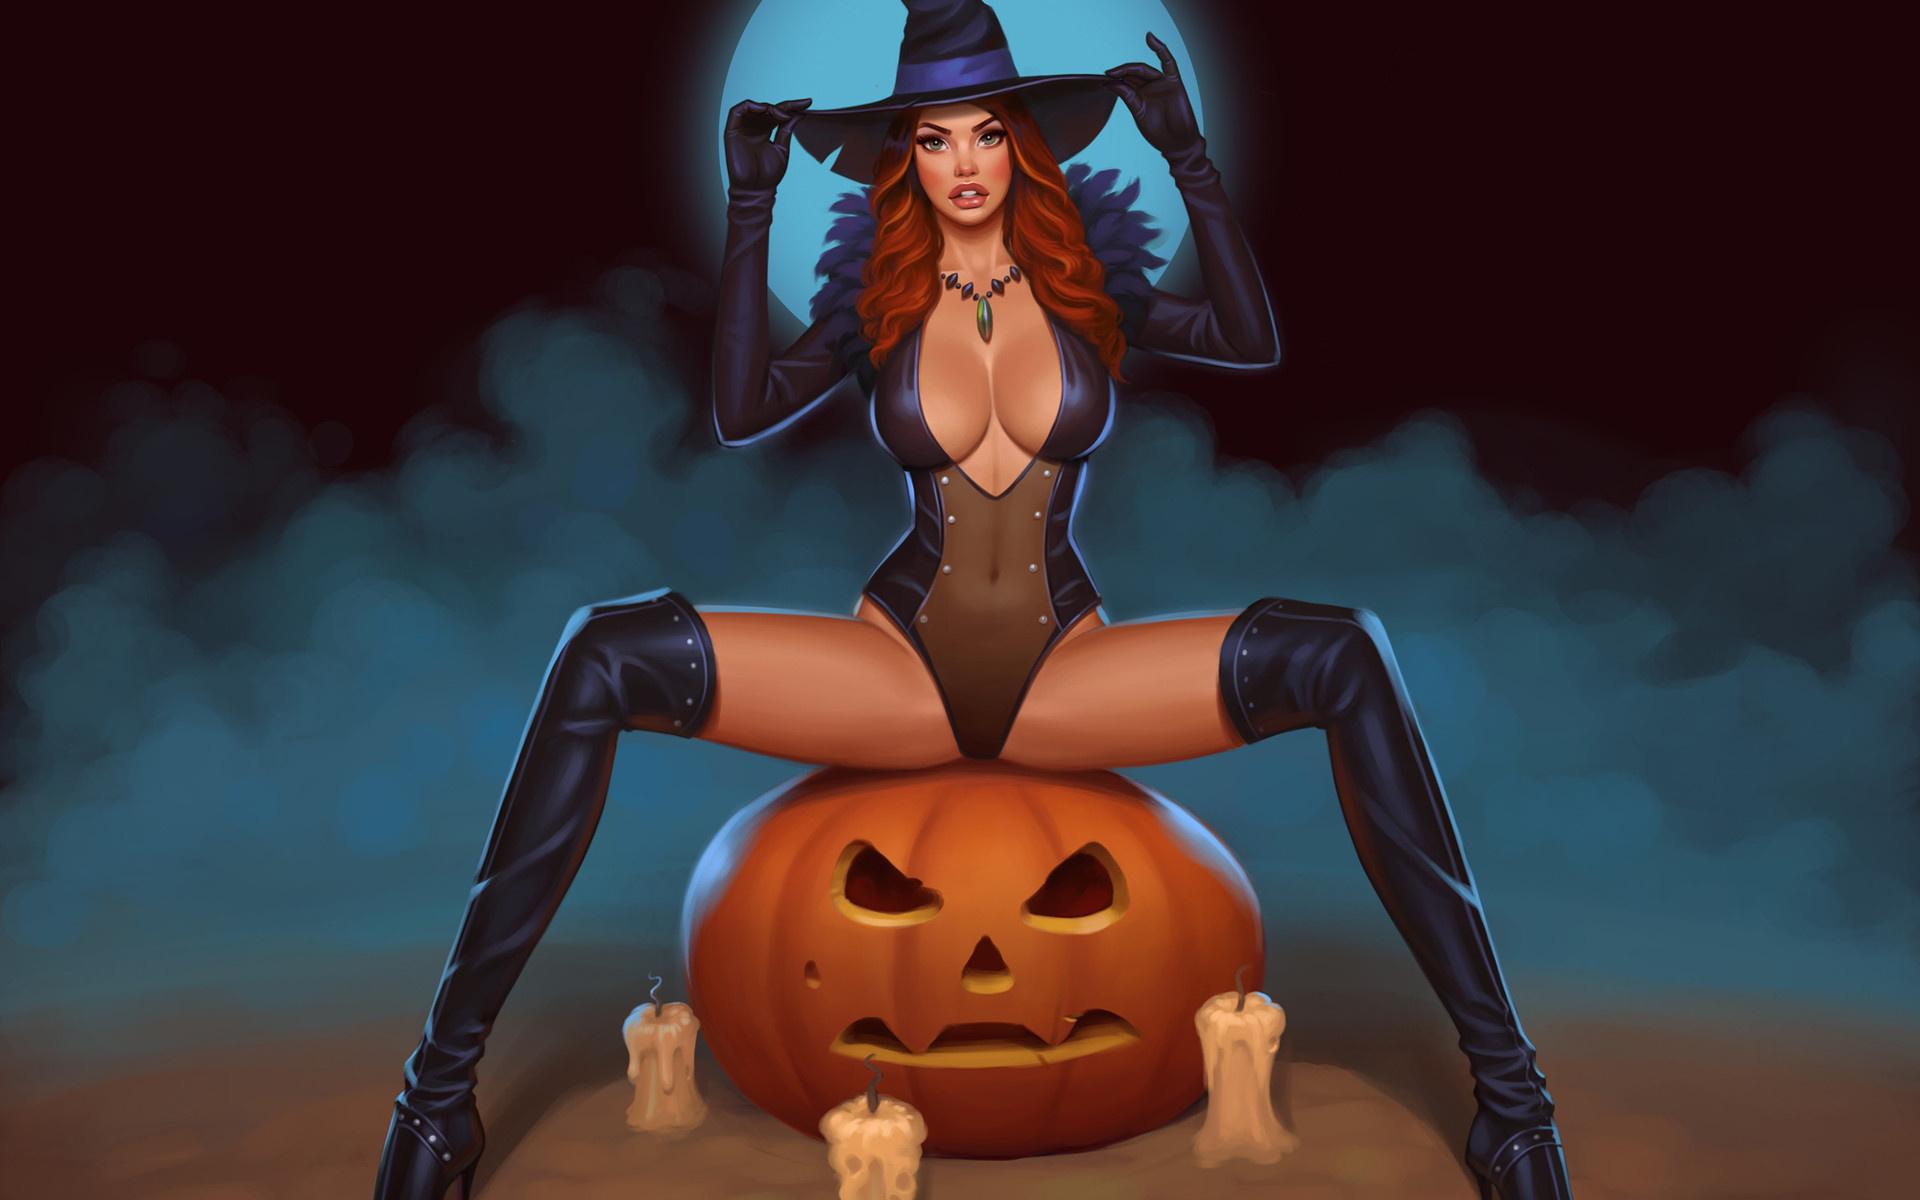 halloween-girls-in-the-nude-ass-pics-cherish